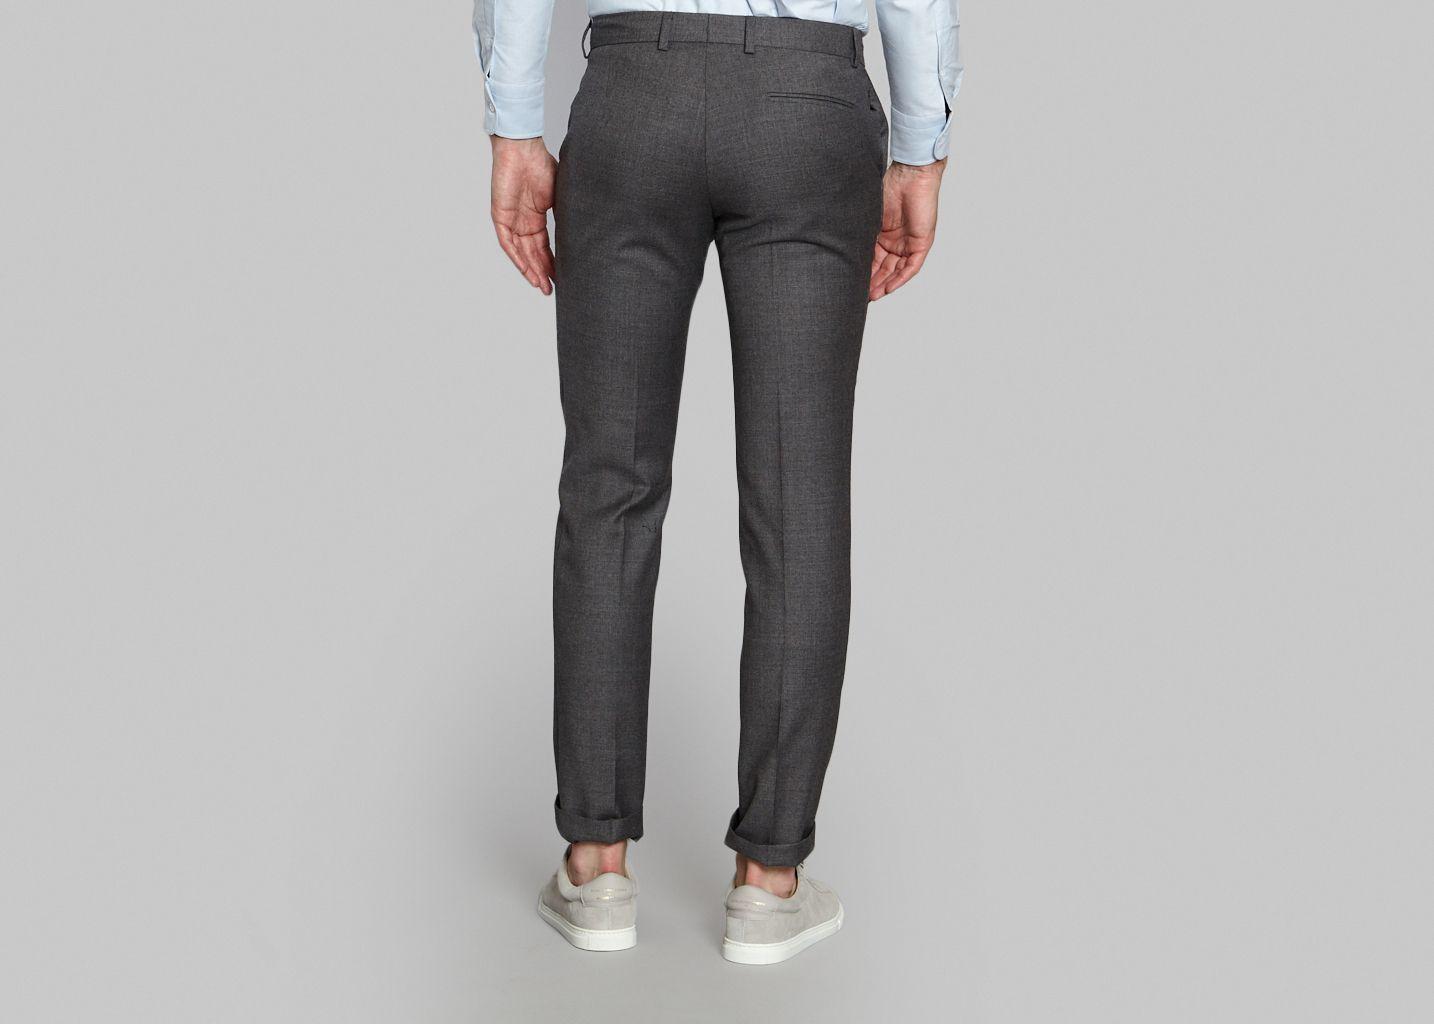 Pantalon Flanelle - Maison Kitsuné